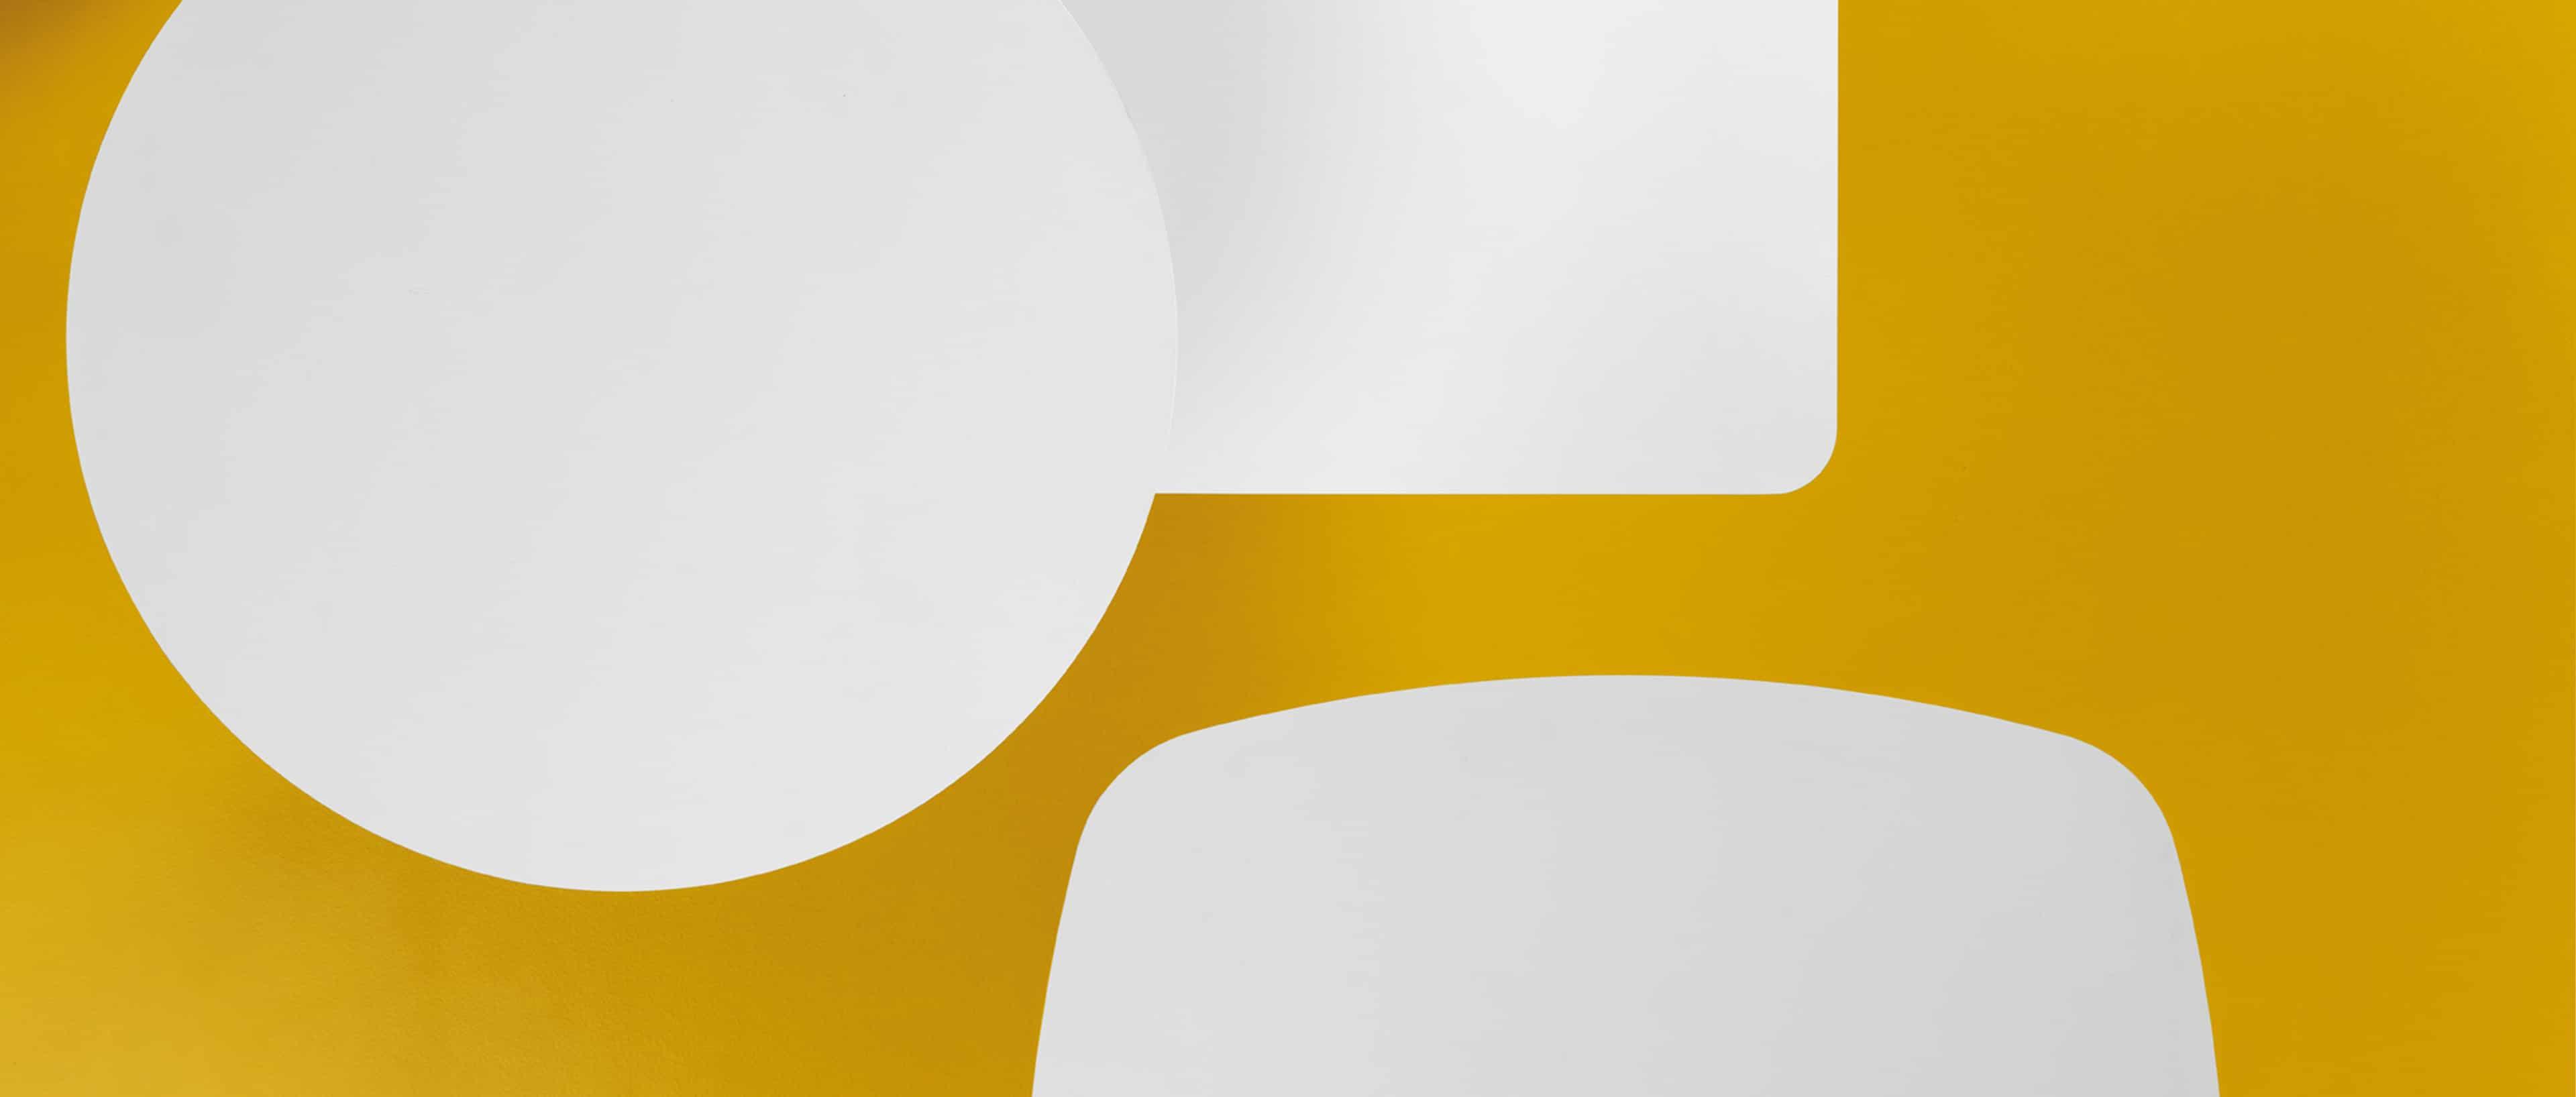 Workspace Expo 2020 — Enea